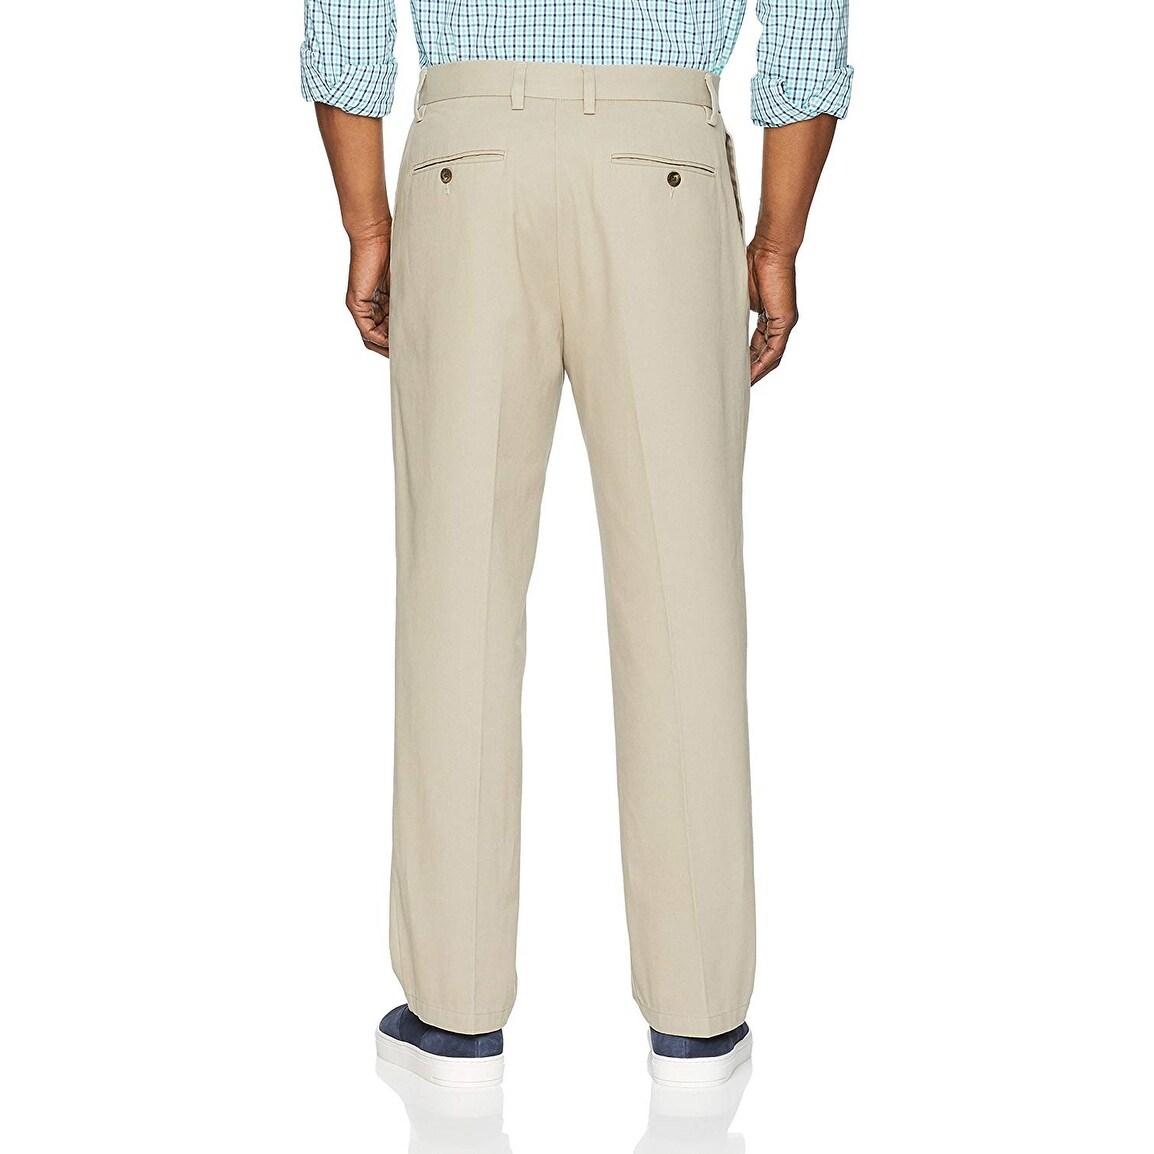 Size 32W x 32L Khaki Essentials Men/'s Slim-Fit Wrinkle-Resistant